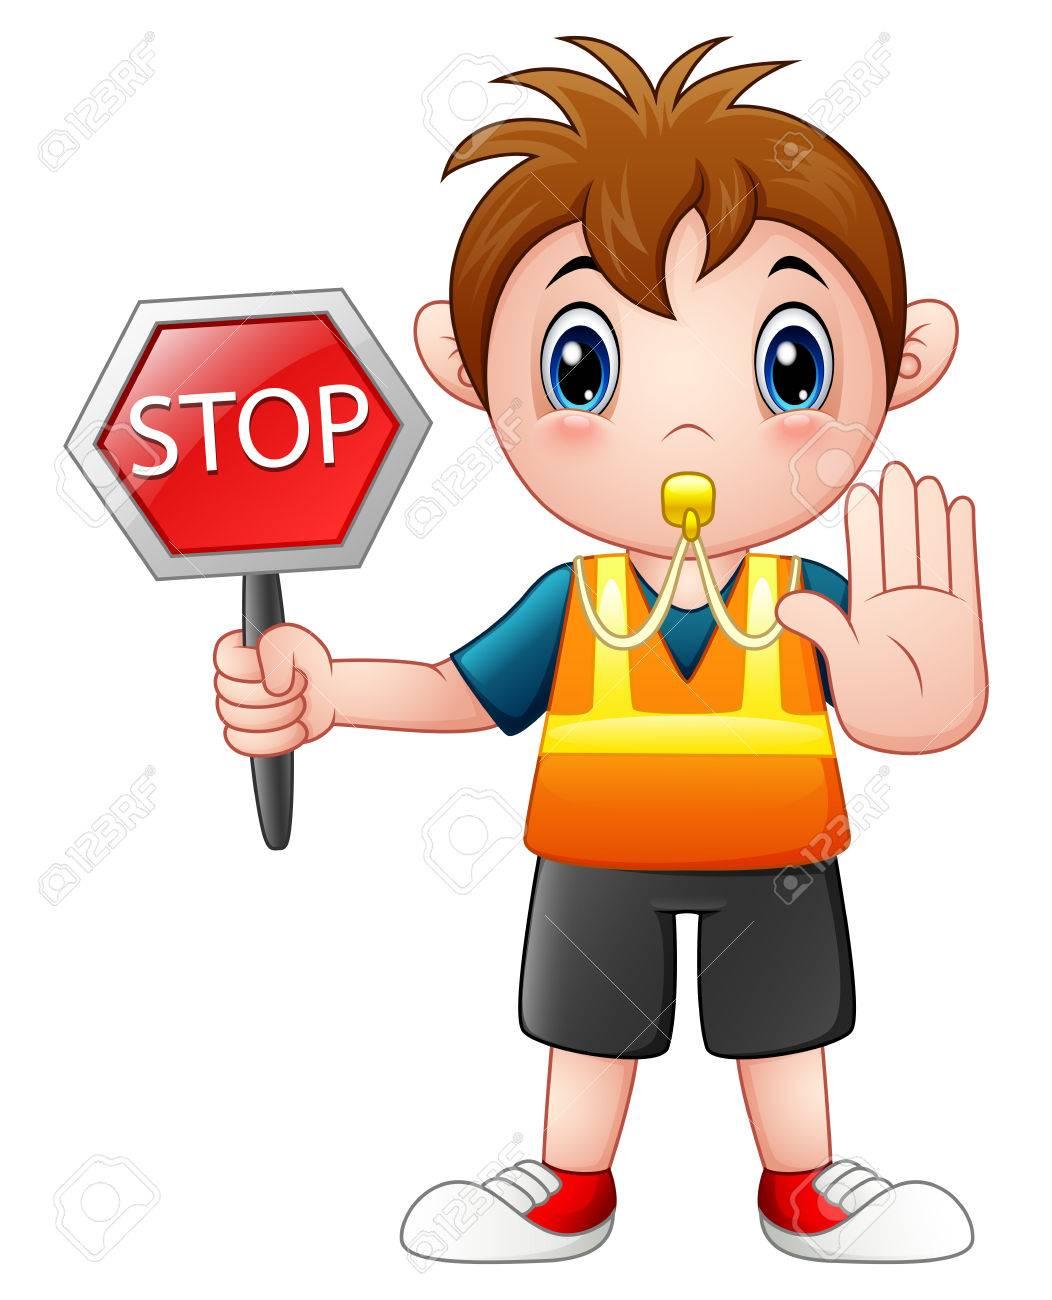 Cartoon boy holding a stop sign.